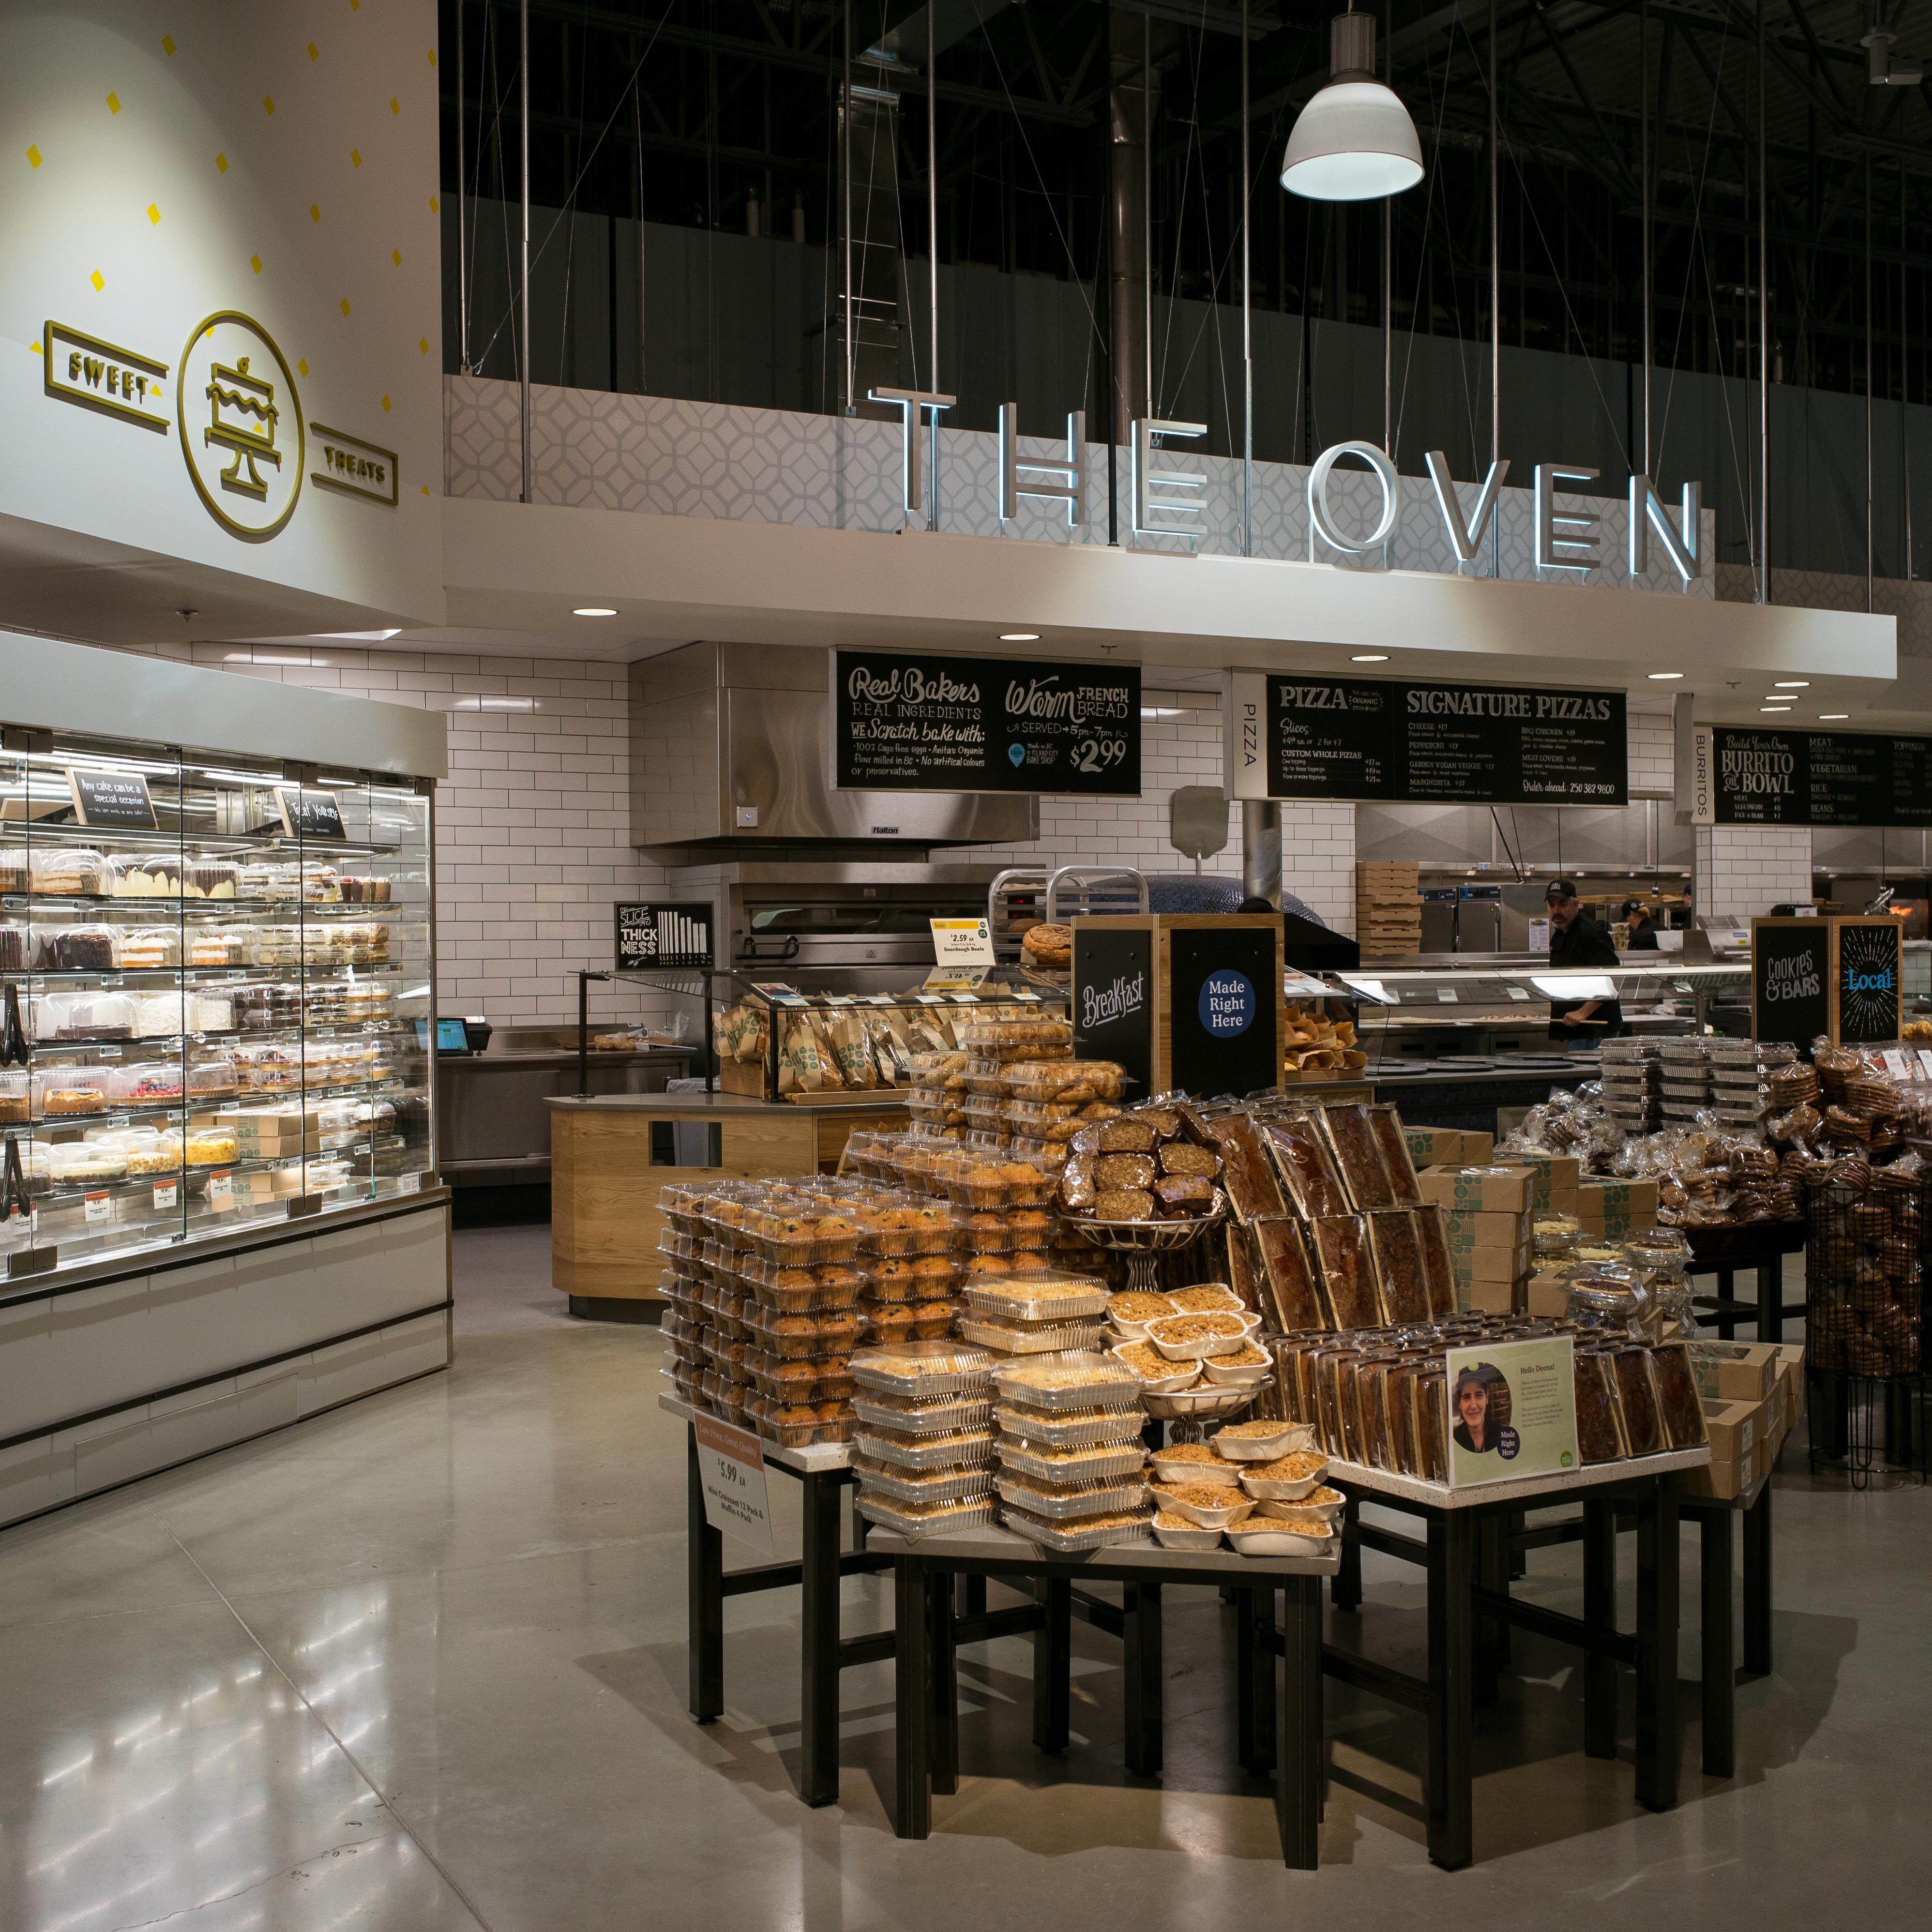 Store in Victoria, British Columbia, Canada, designed by